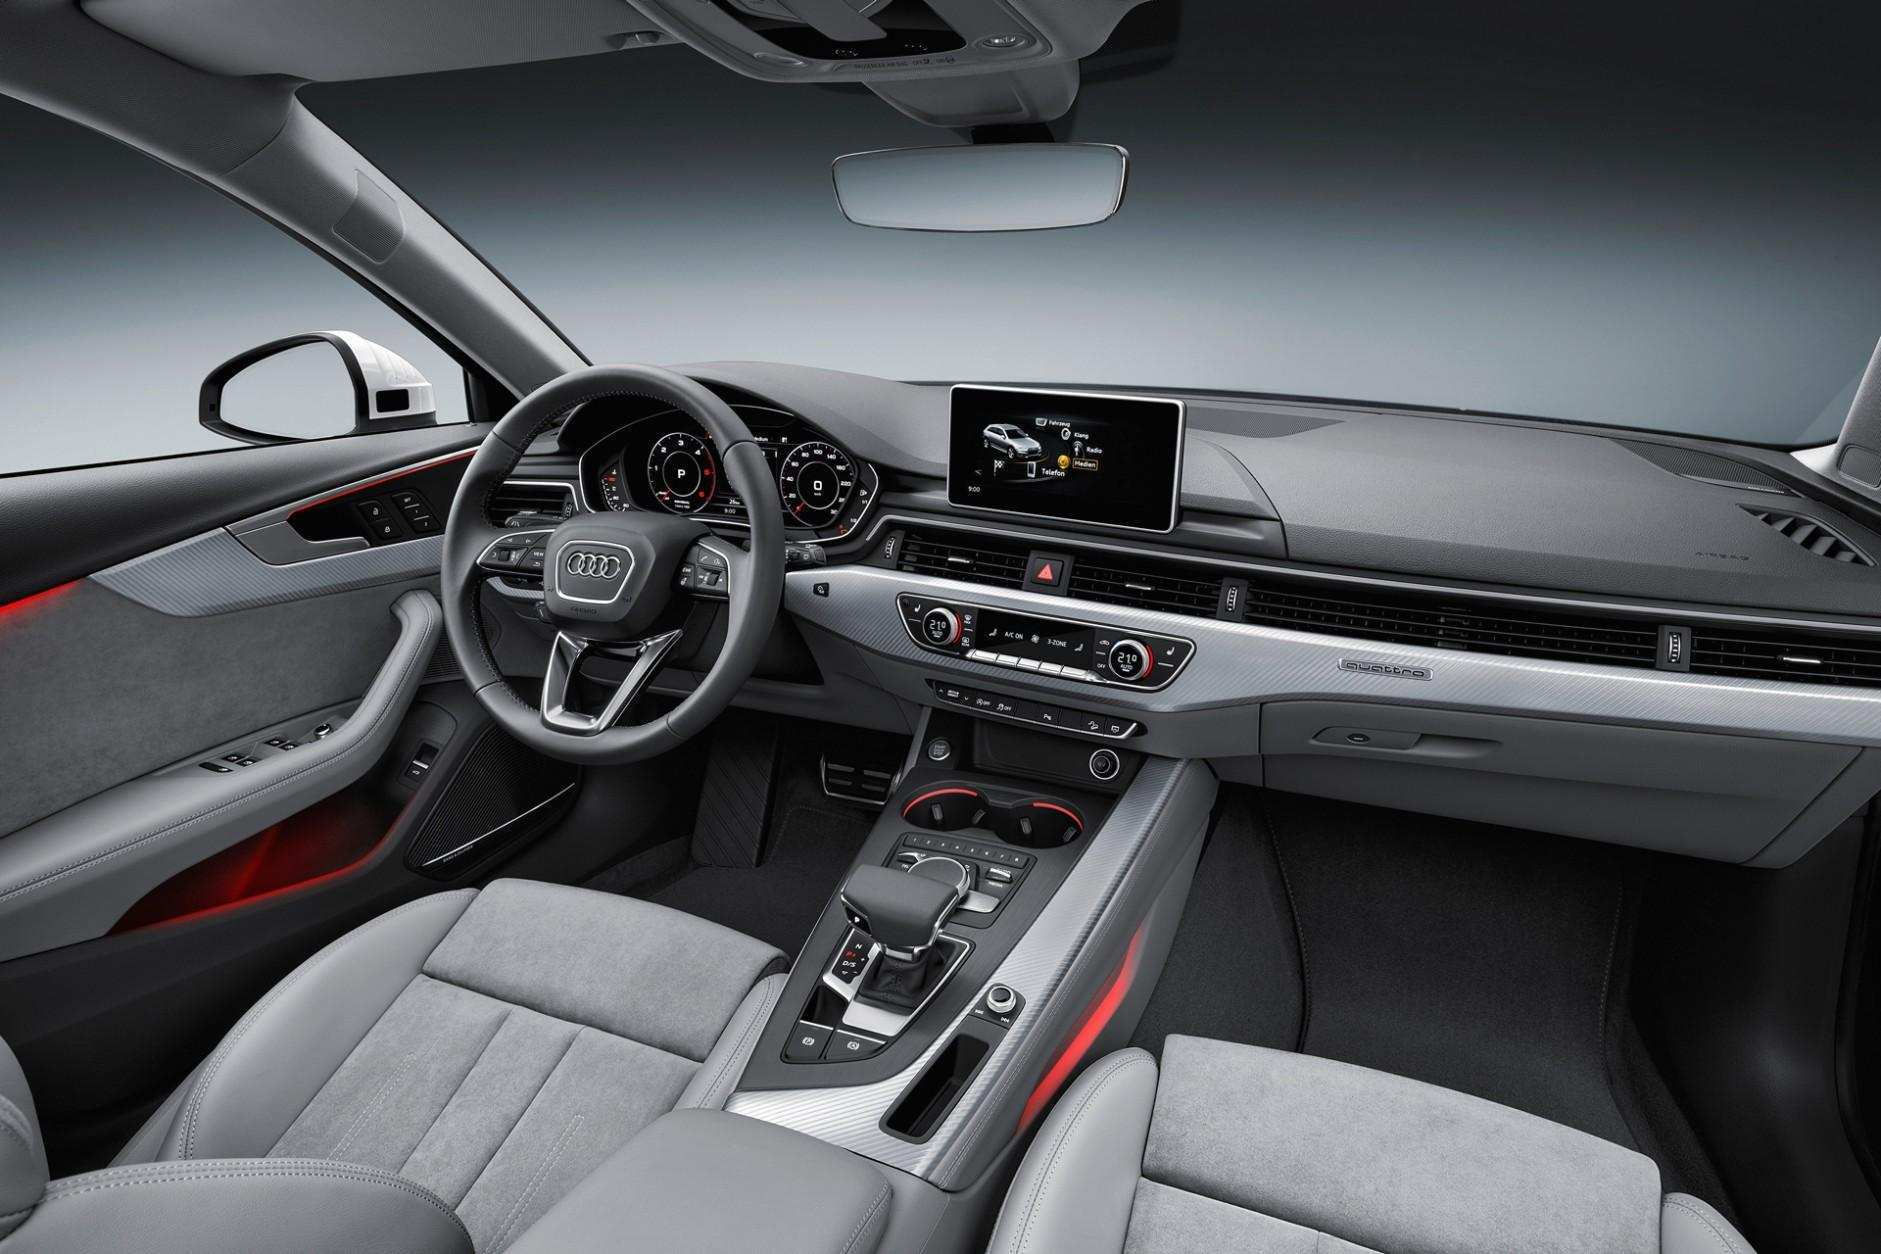 38 Concept of 2019 Audi A4 Interior Interior by 2019 Audi A4 Interior